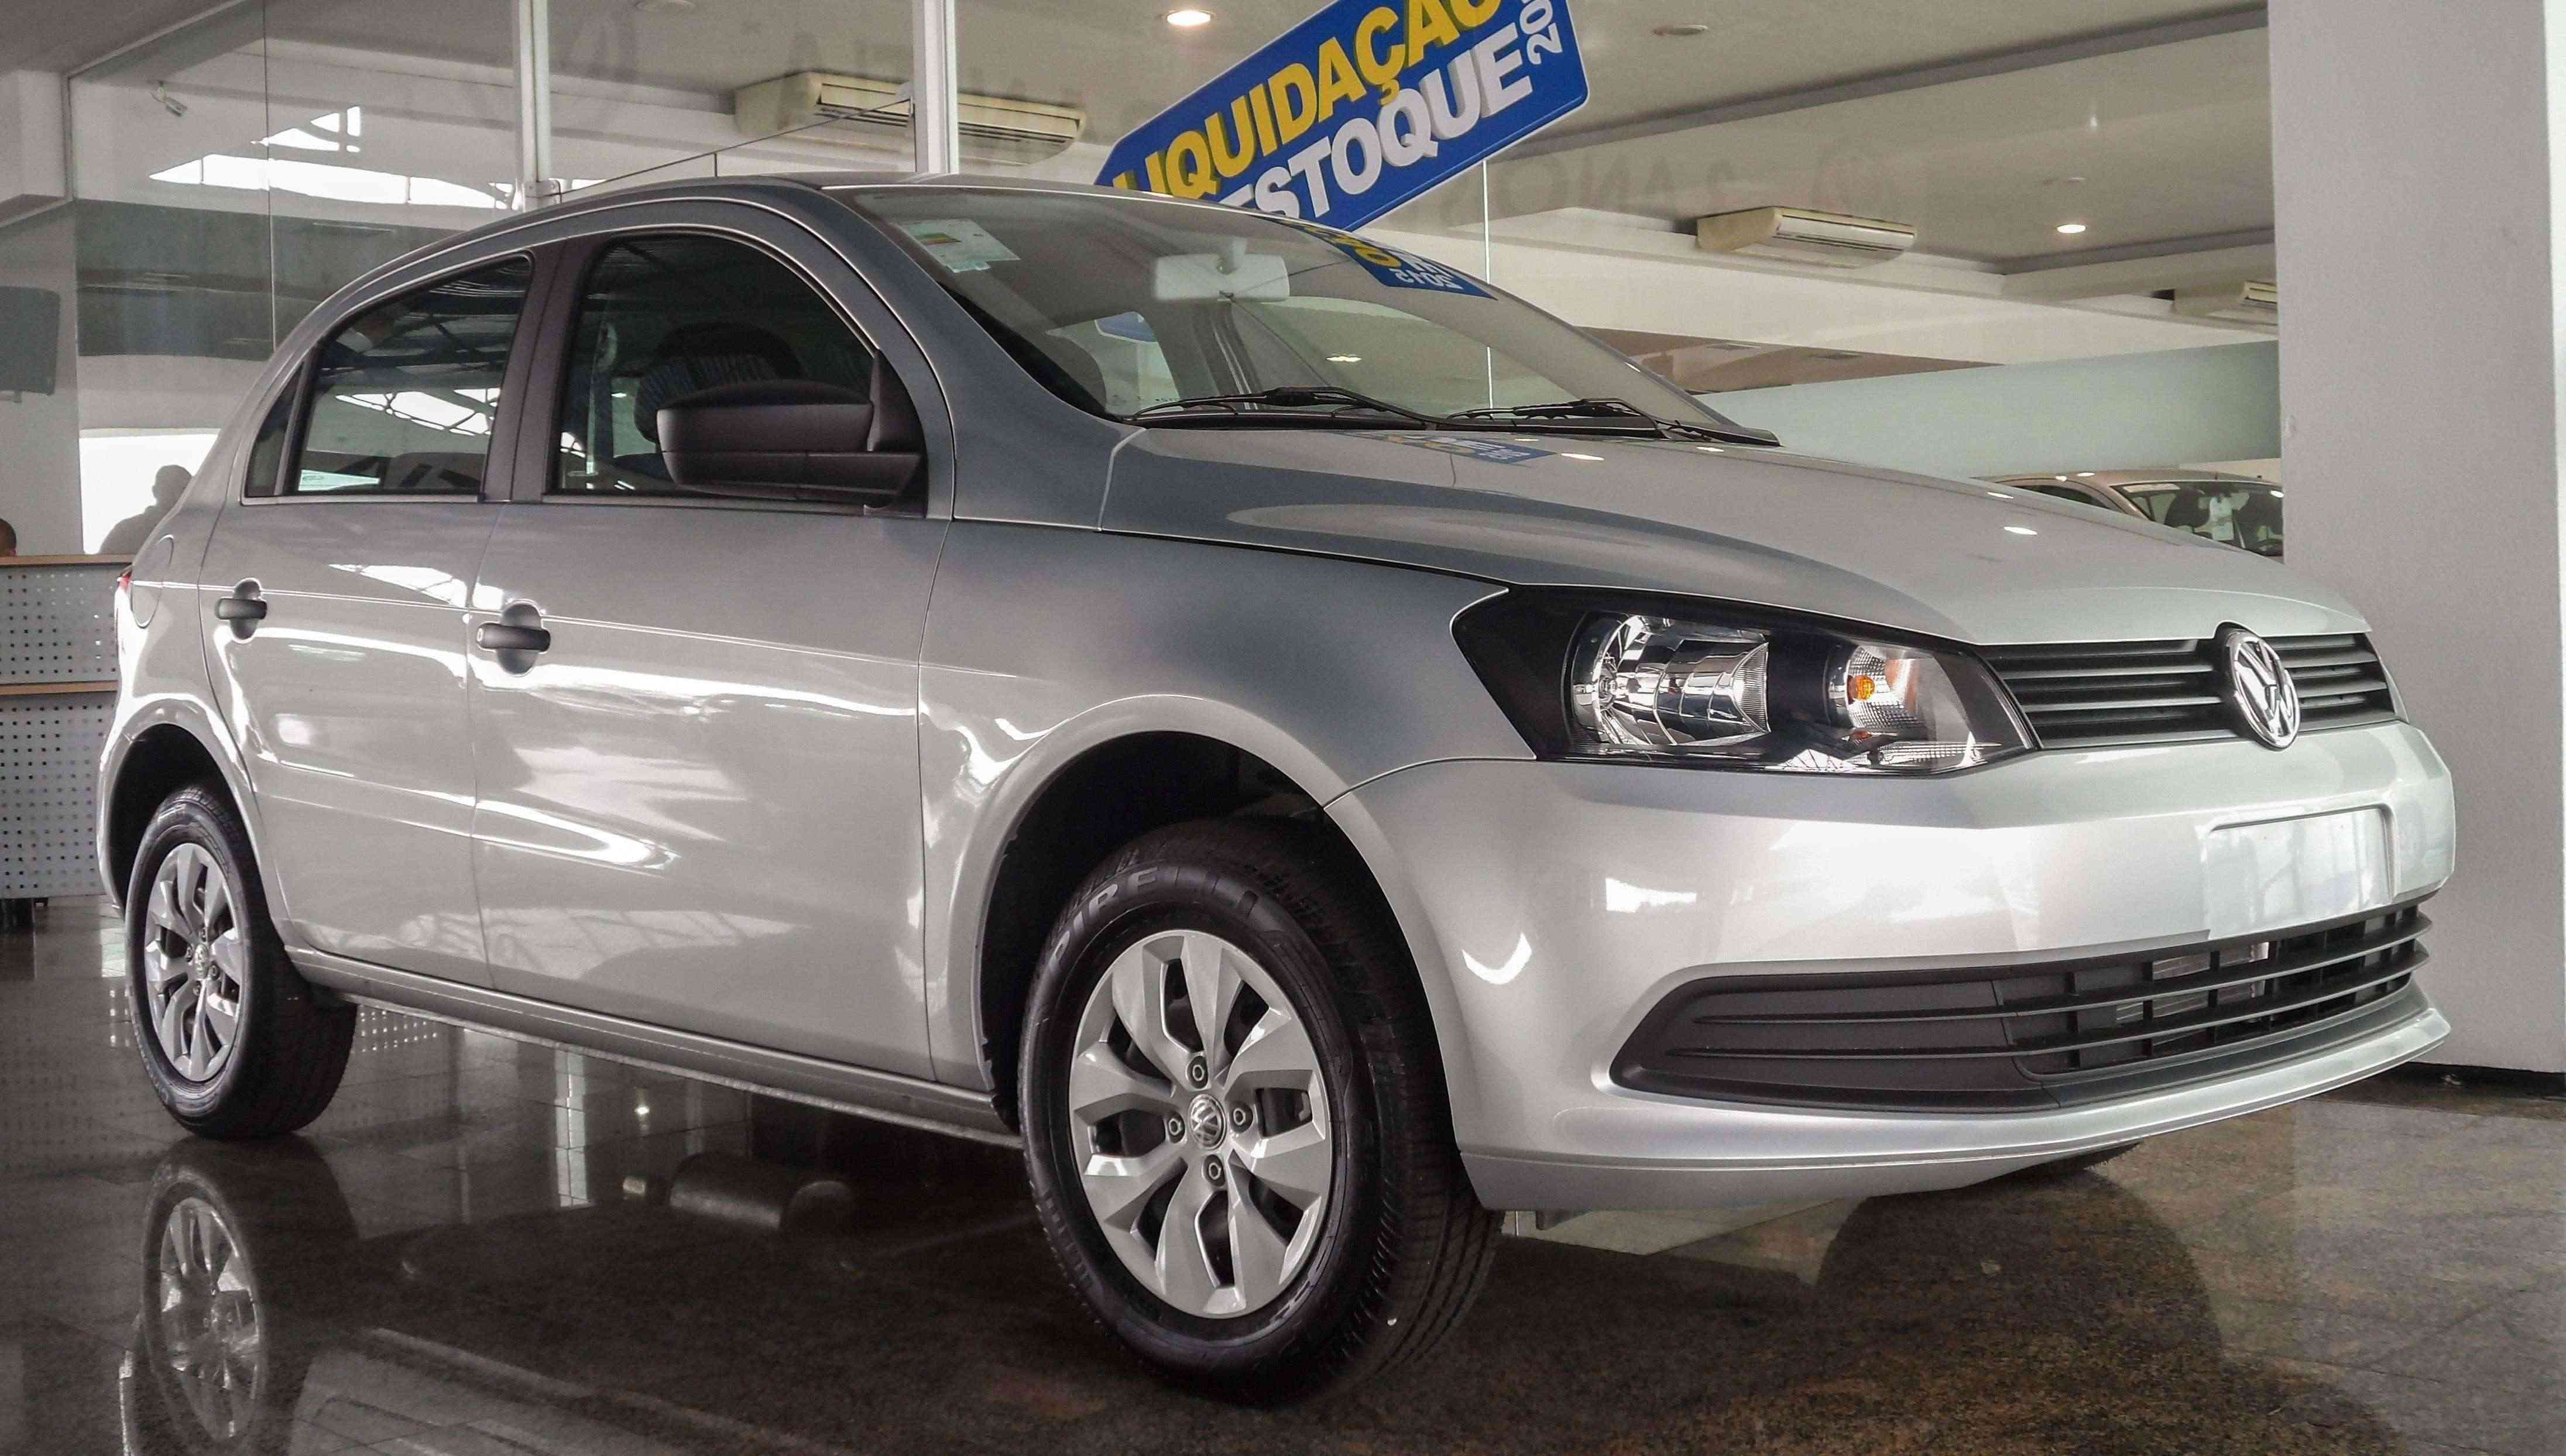 Carnaval de Ofertas: VW Gol 1.6 Trendline por R$ 39.990